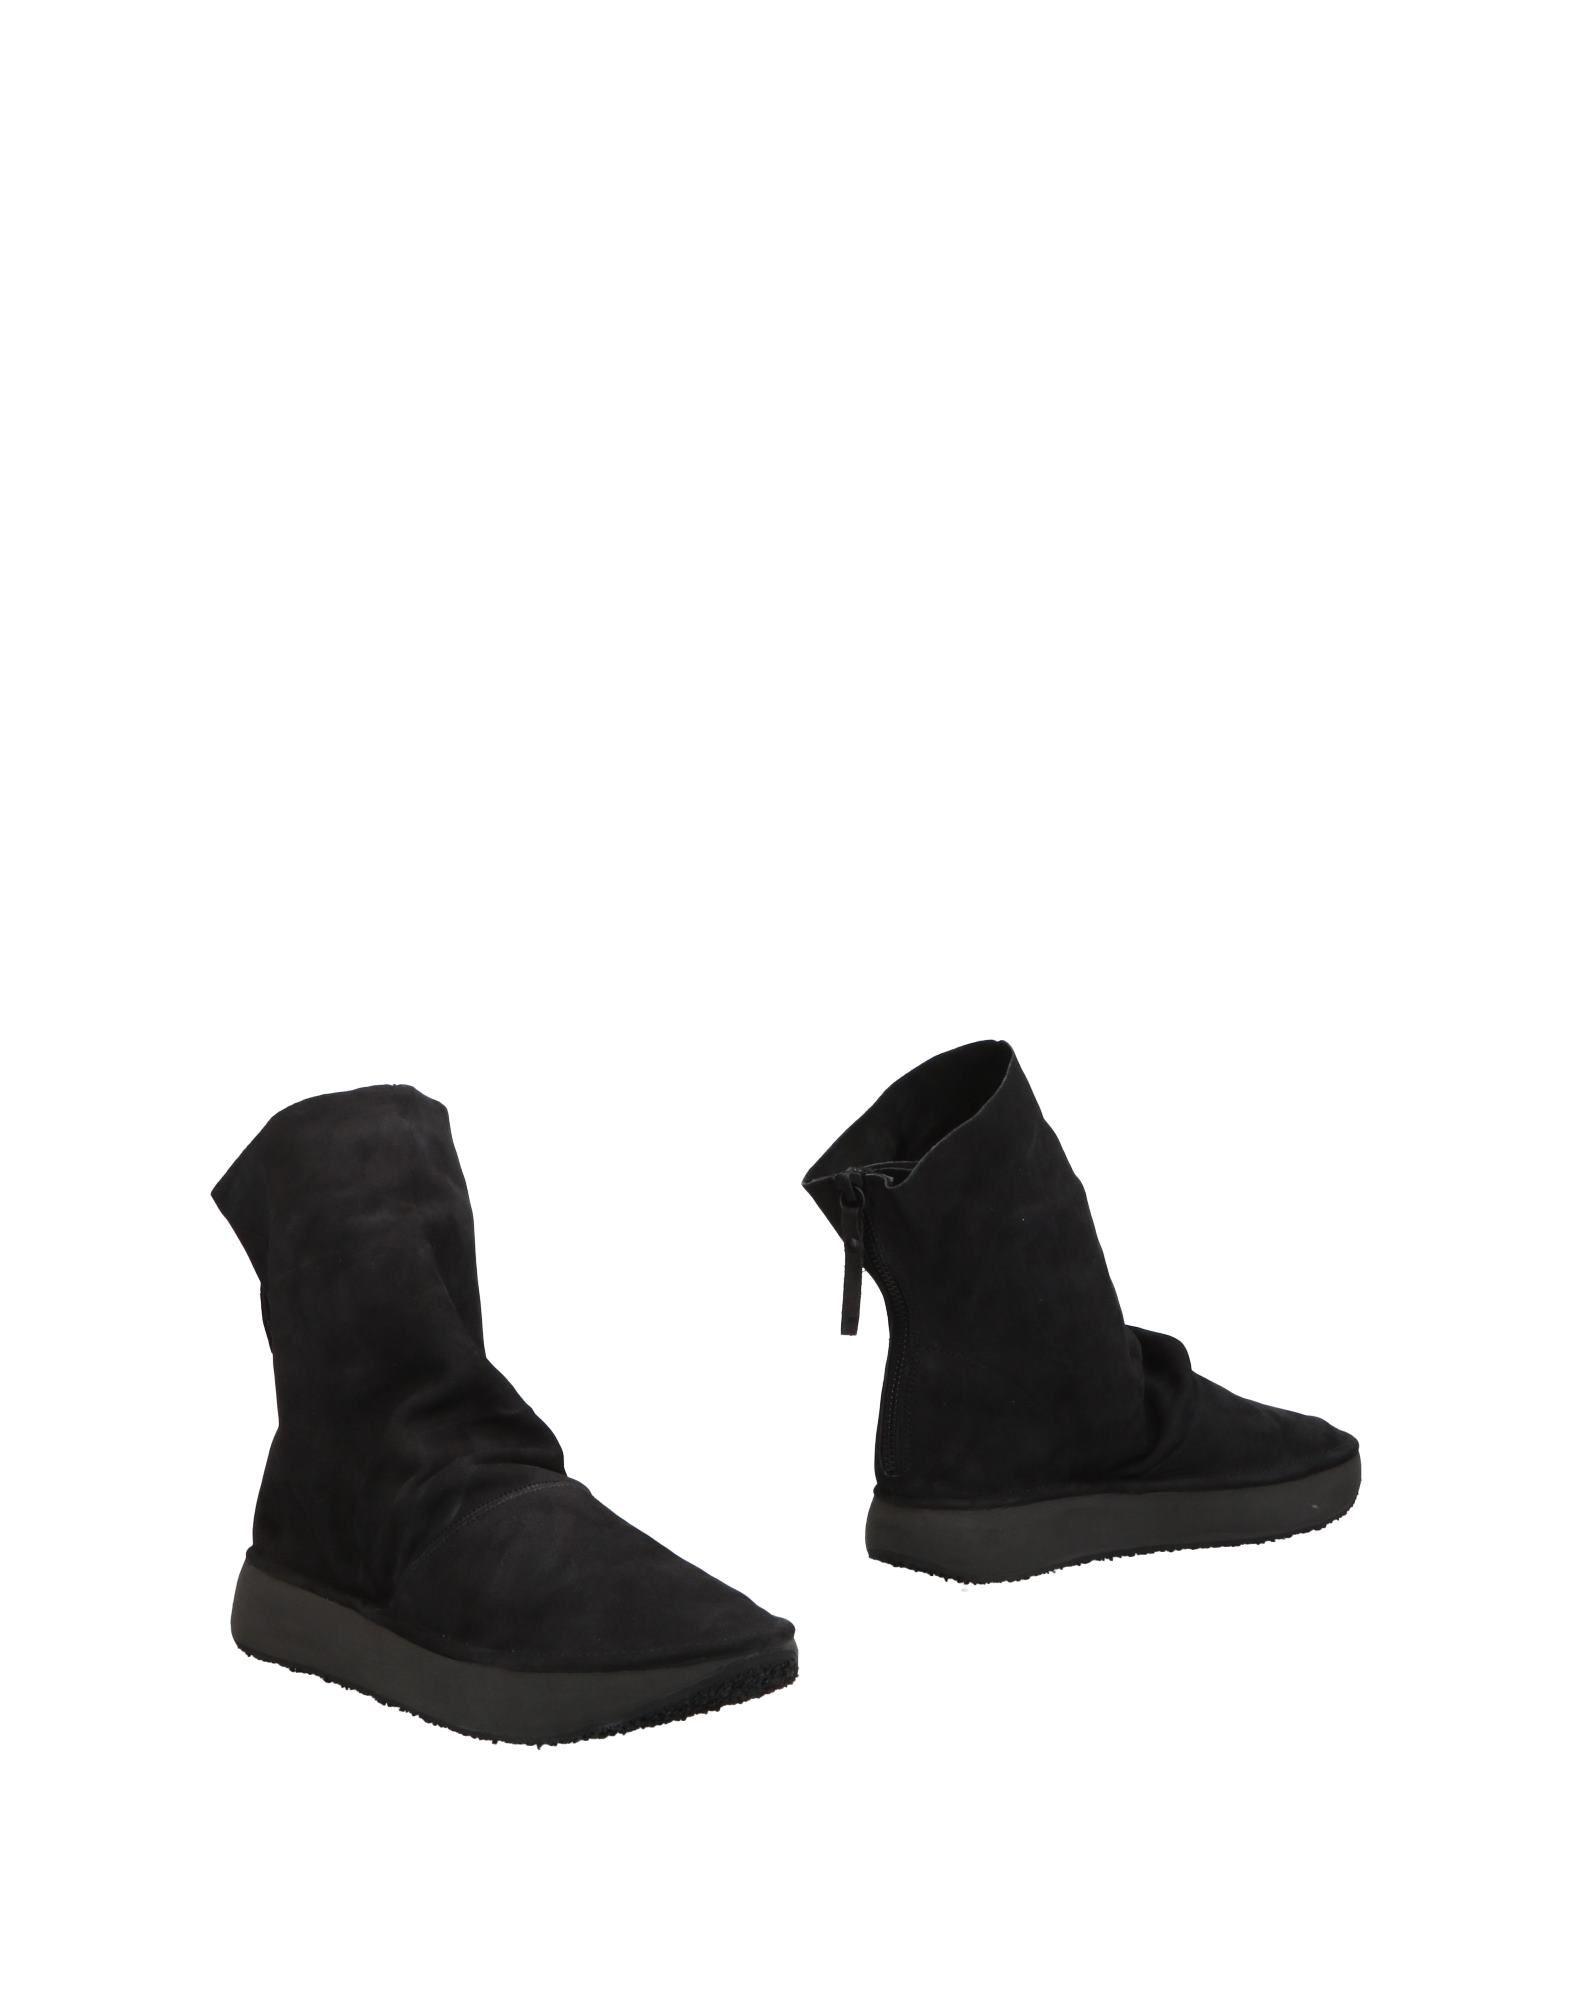 Puro Individual Secret Stiefelette Neue Damen  11507890QO Neue Stiefelette Schuhe c3f275